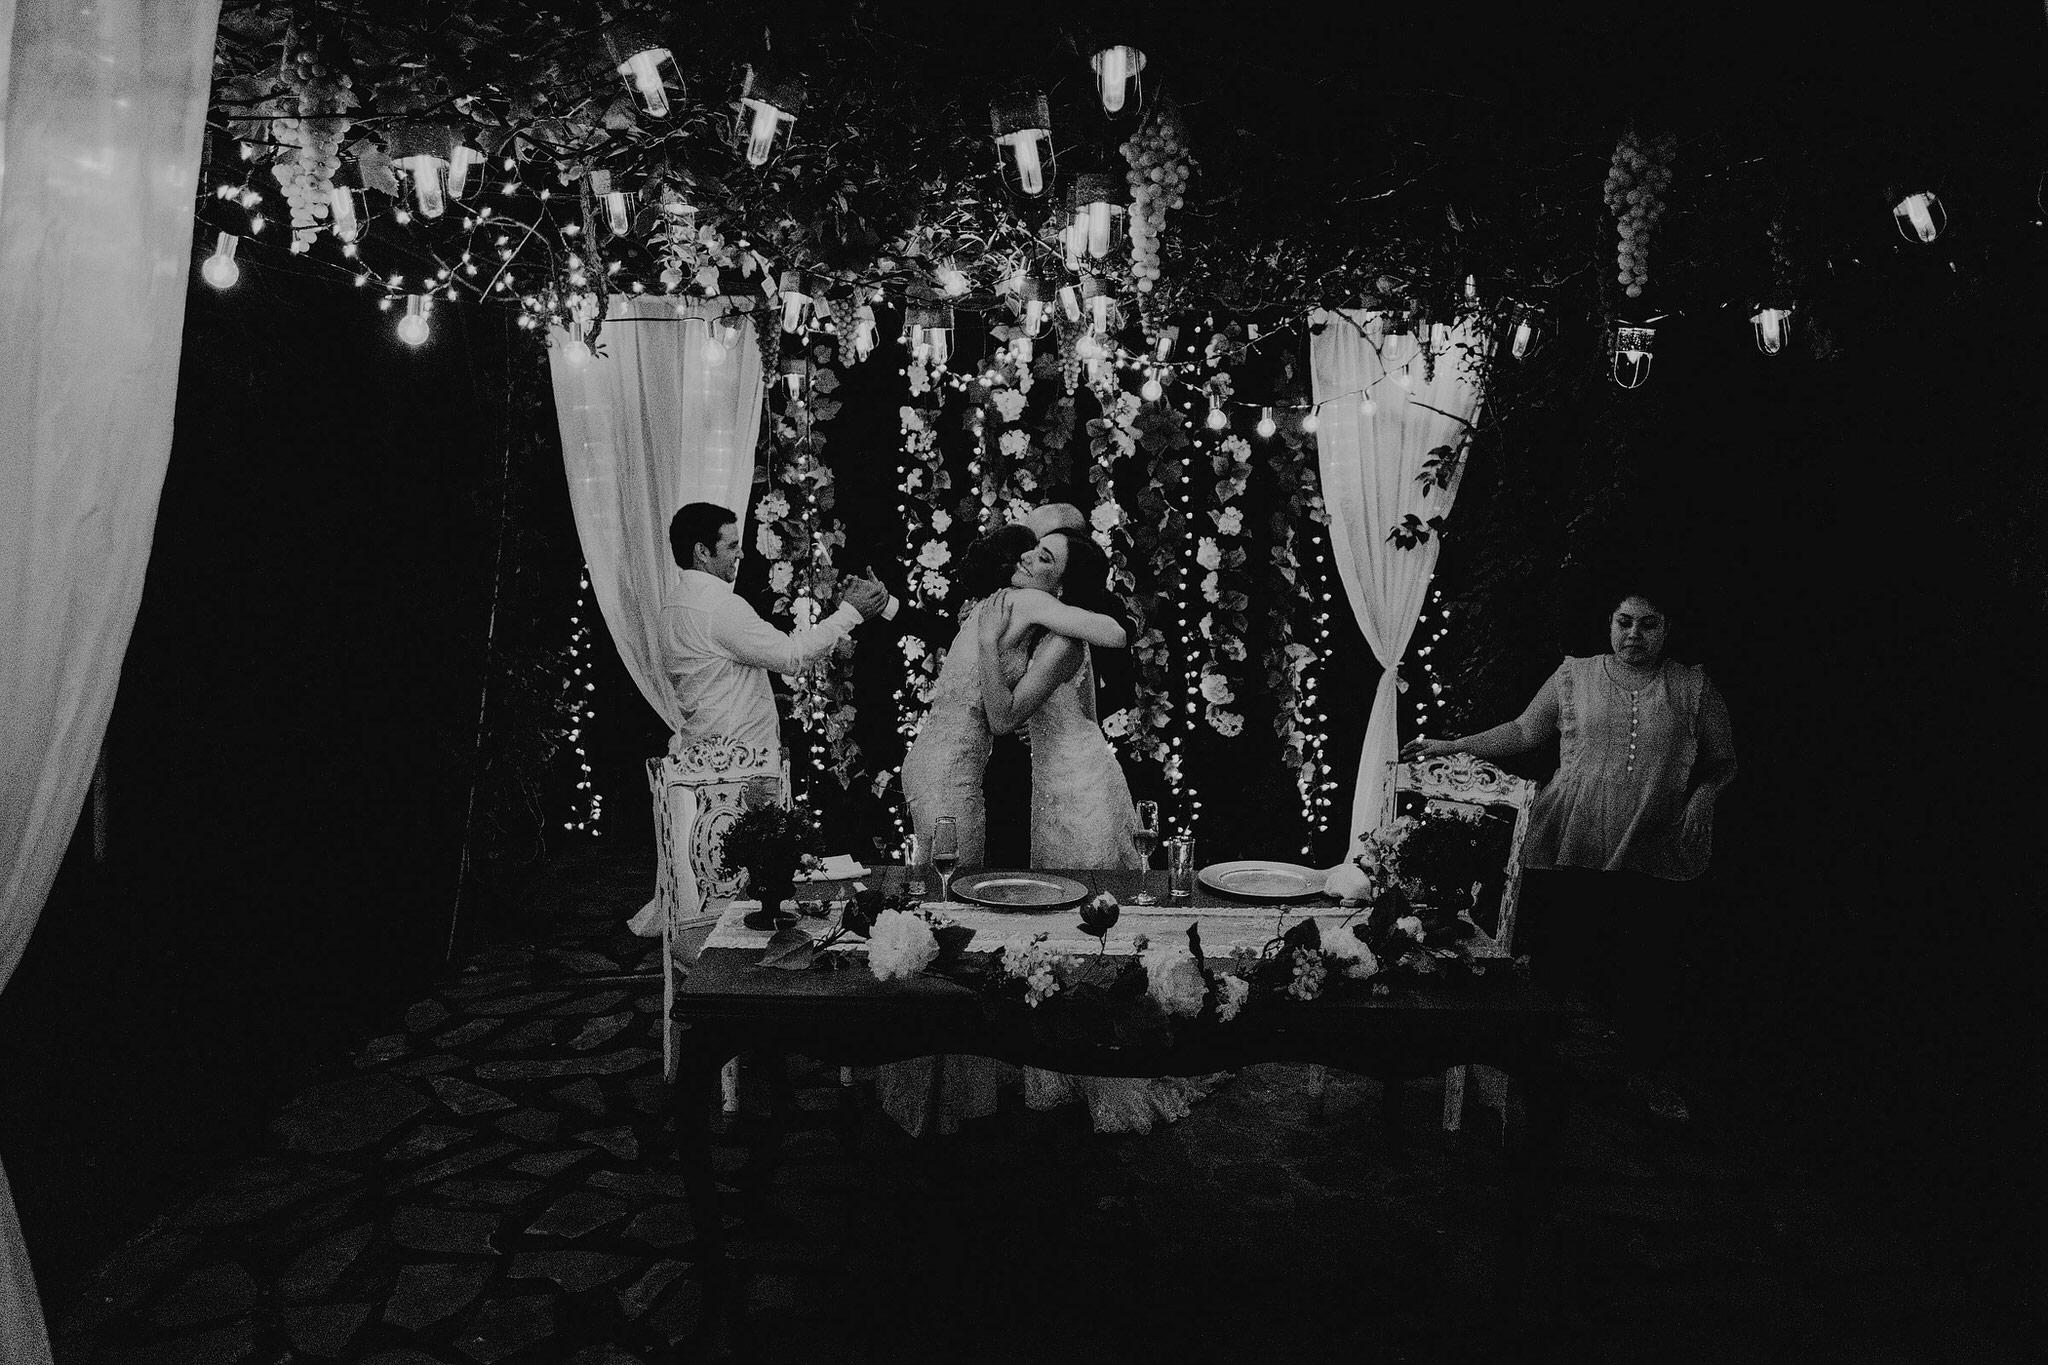 064-Iliana-raymundo-wedding-las-jacarandas-santiago-nl.jpg